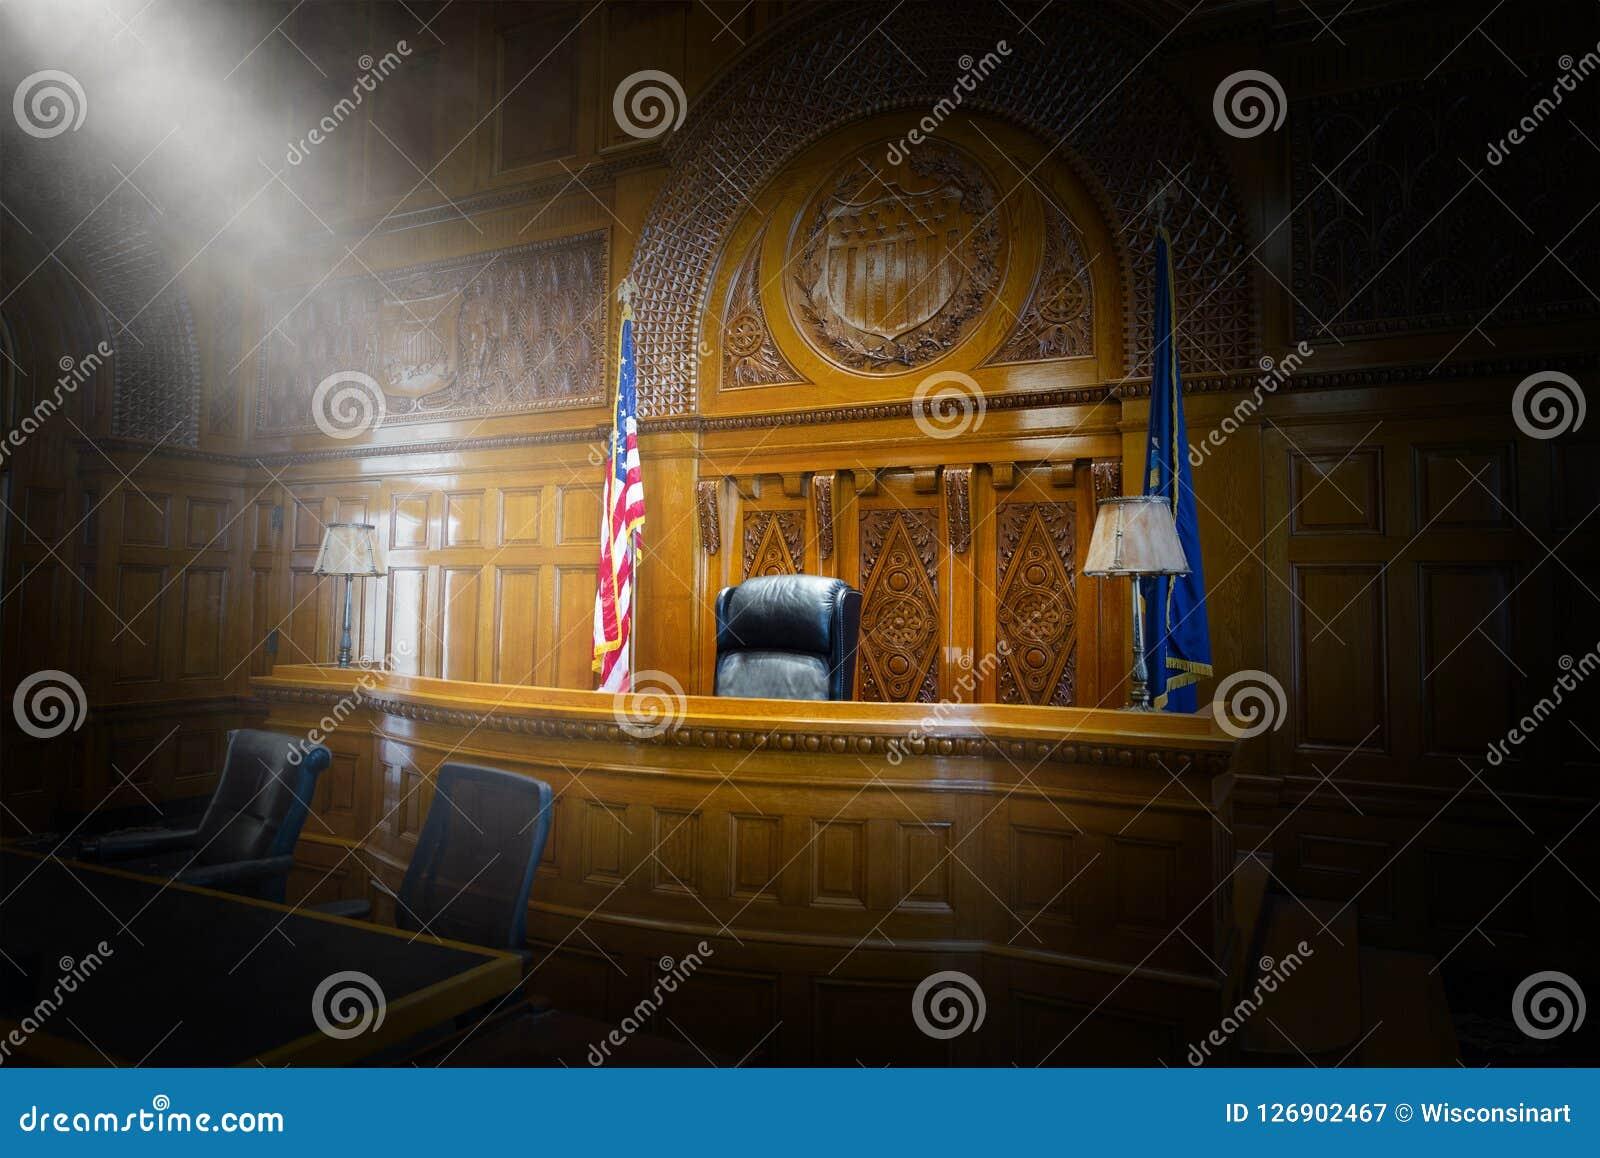 Закон, суд, зал судебных заседаний, судья, стул, стенд